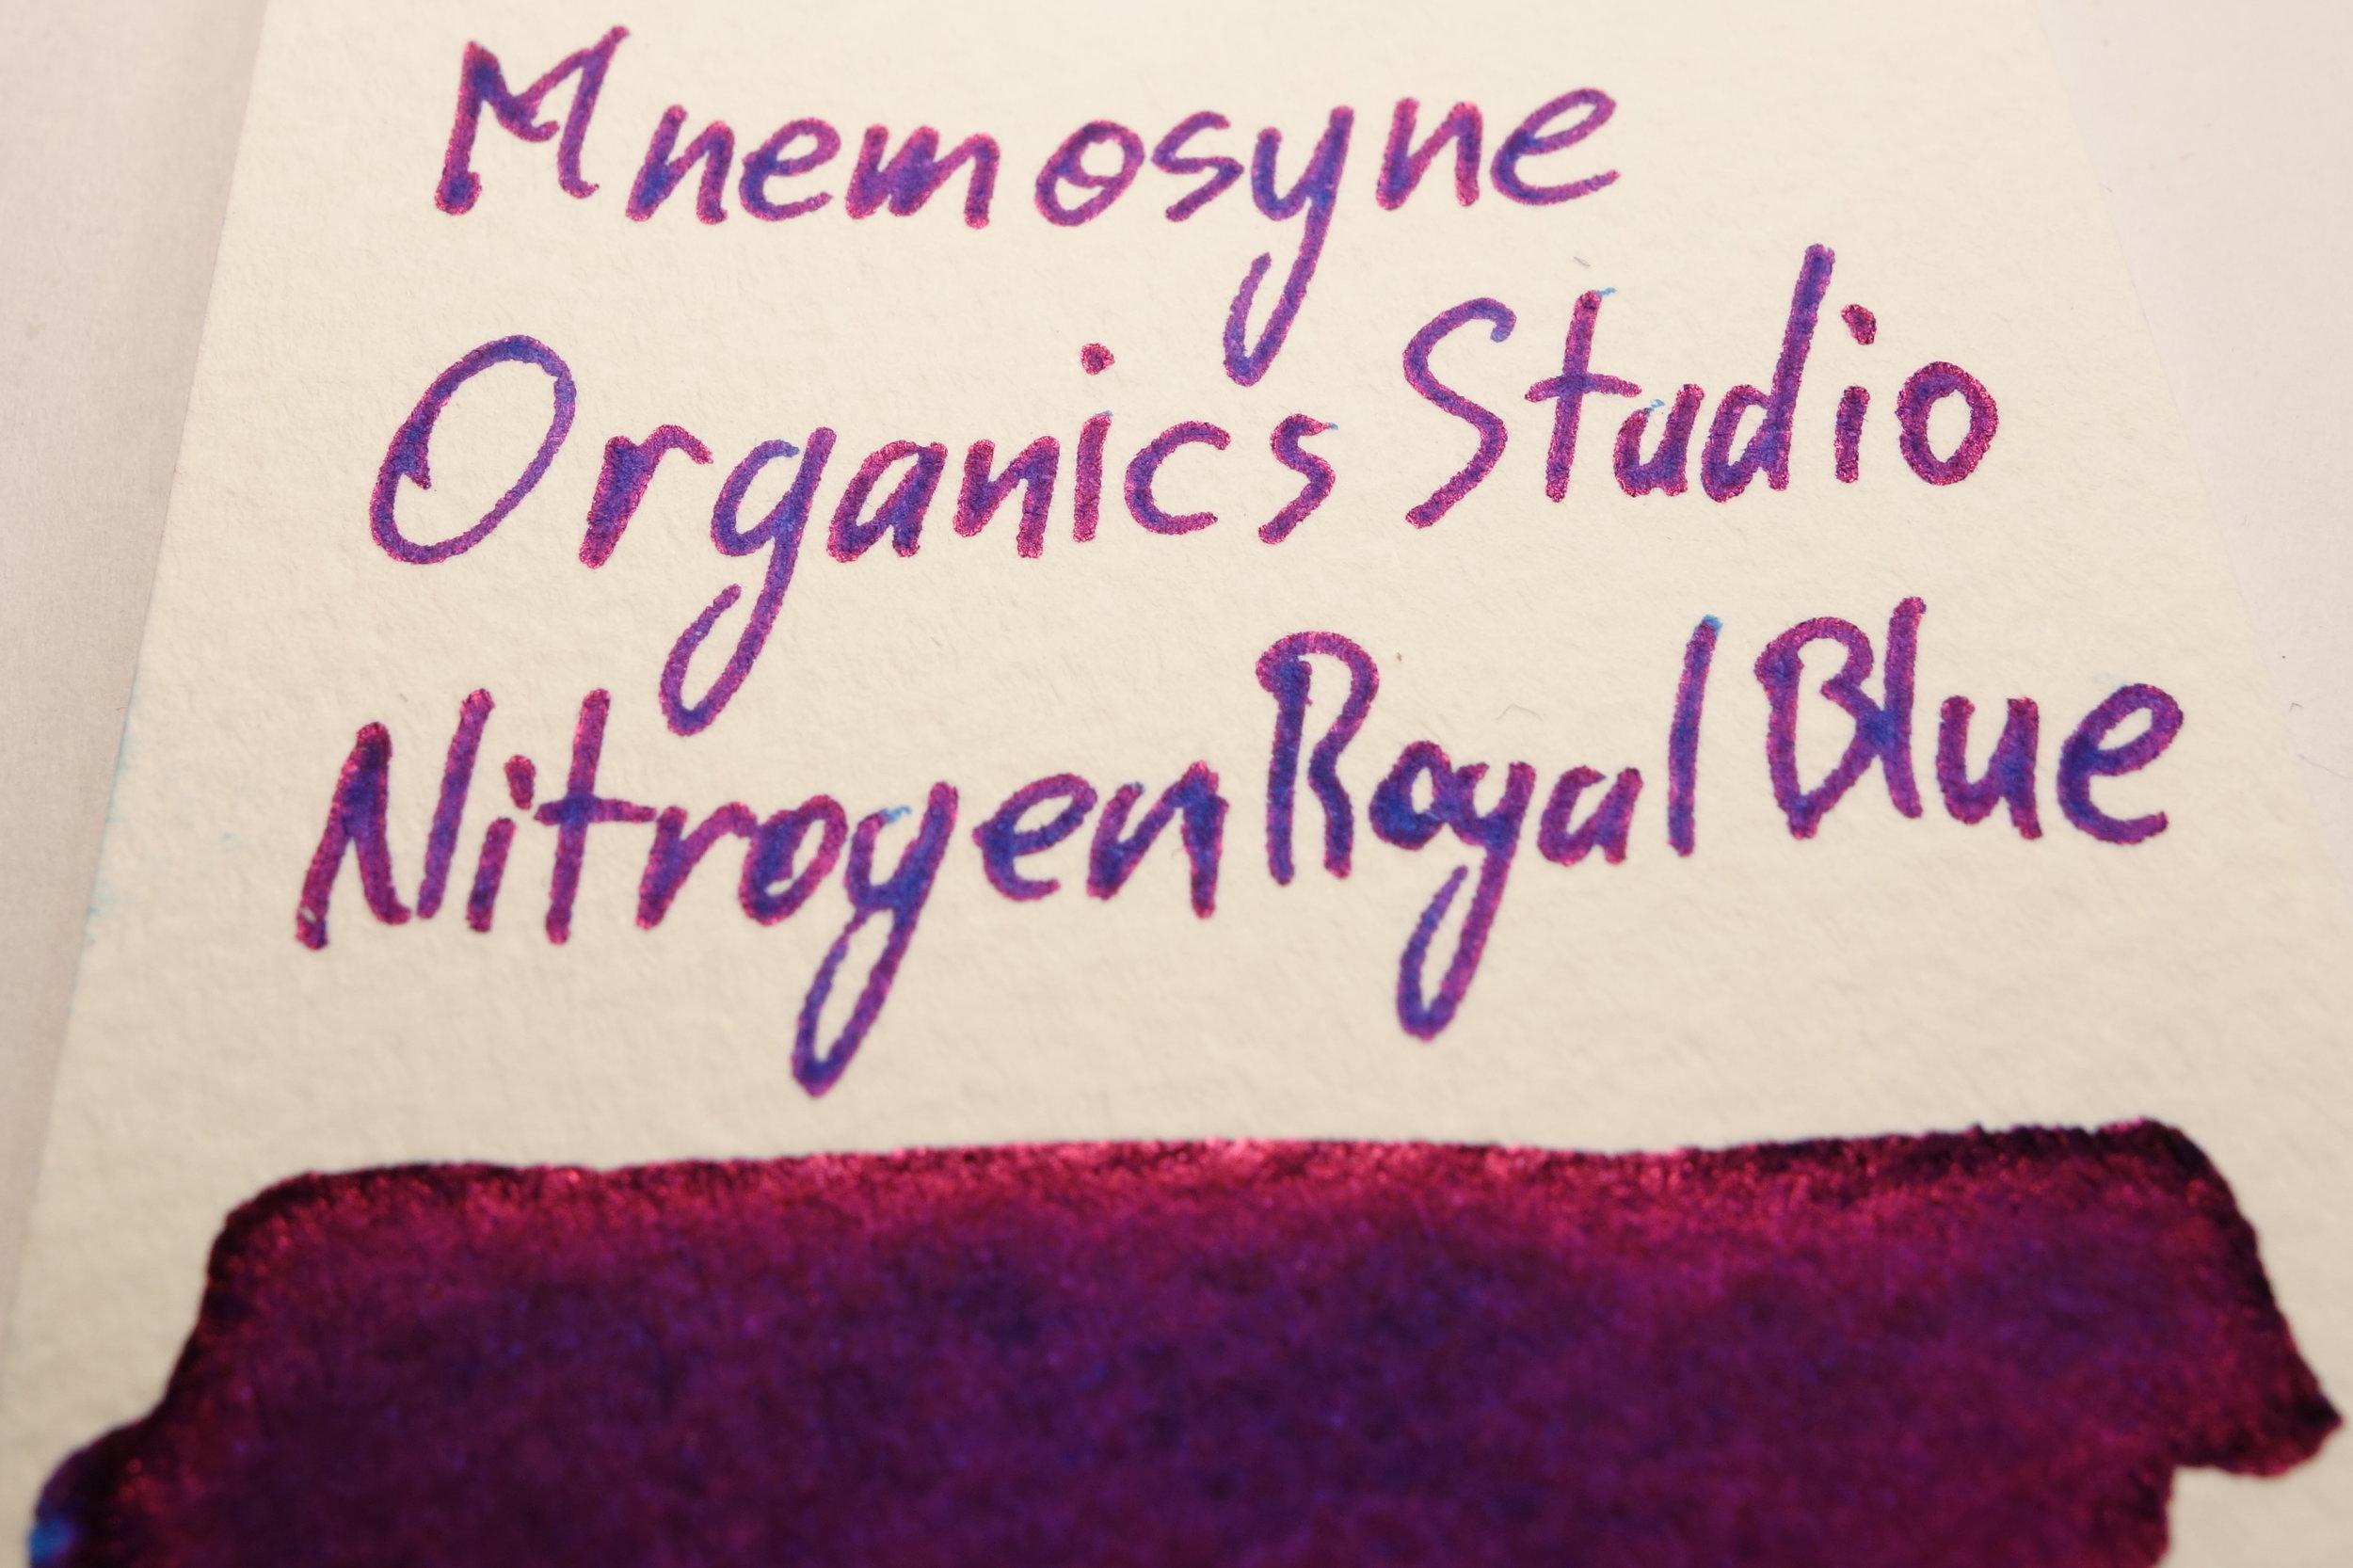 Organics Studio Nitrogen Royal Blue Sheen Mnemosyne.JPG